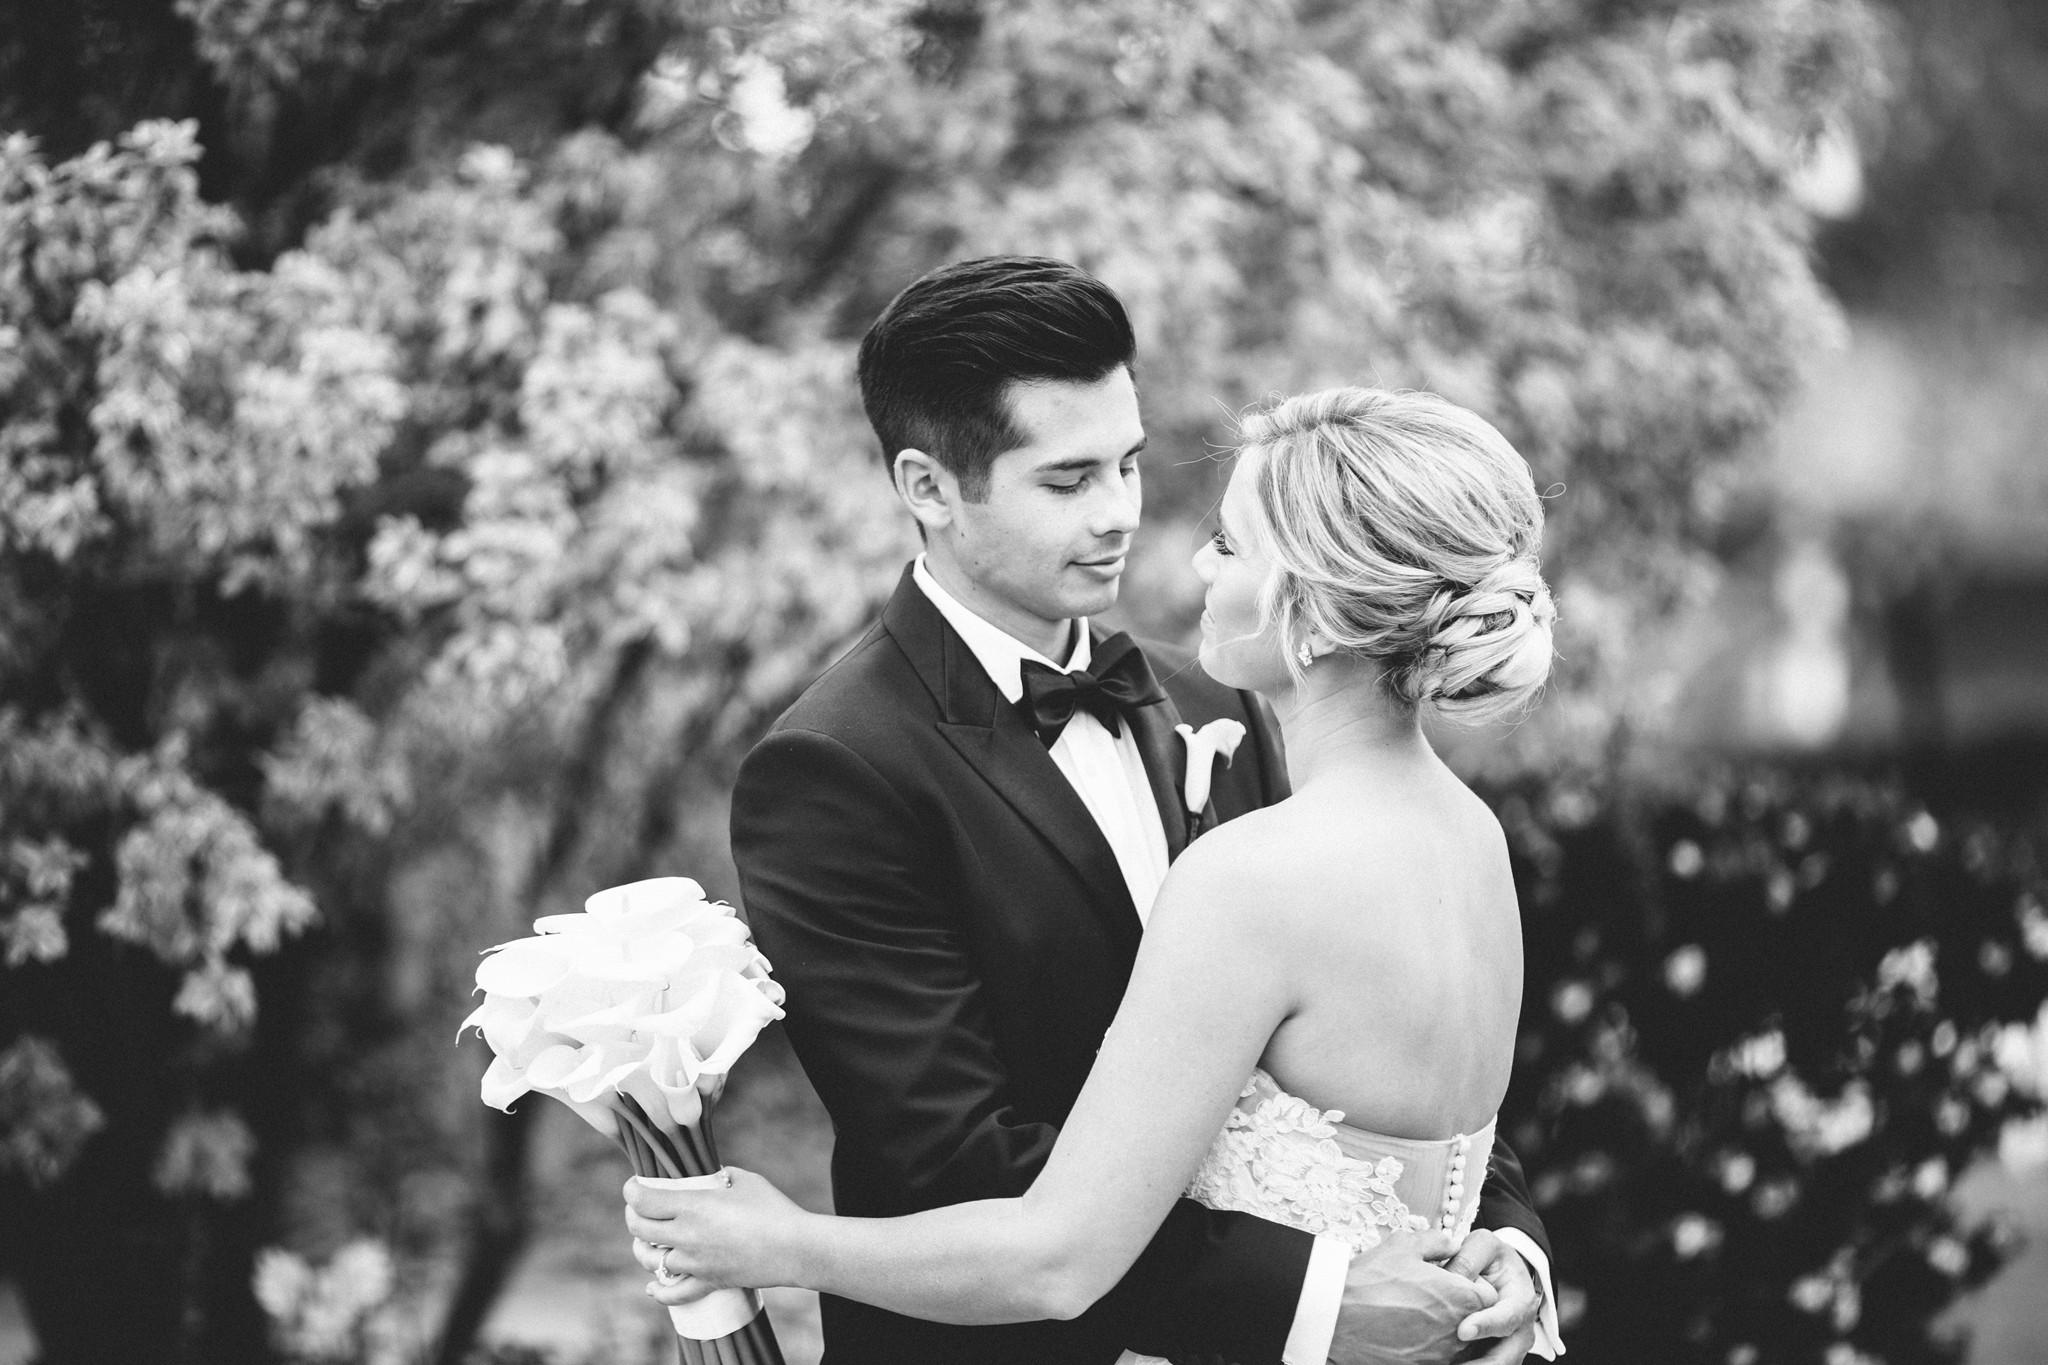 7 THEDELAURAS_THE_INN_AT_RANCHO_SANTA_FE_WEDDING_BRIDAL BOUQUET_BLOG007.jpg